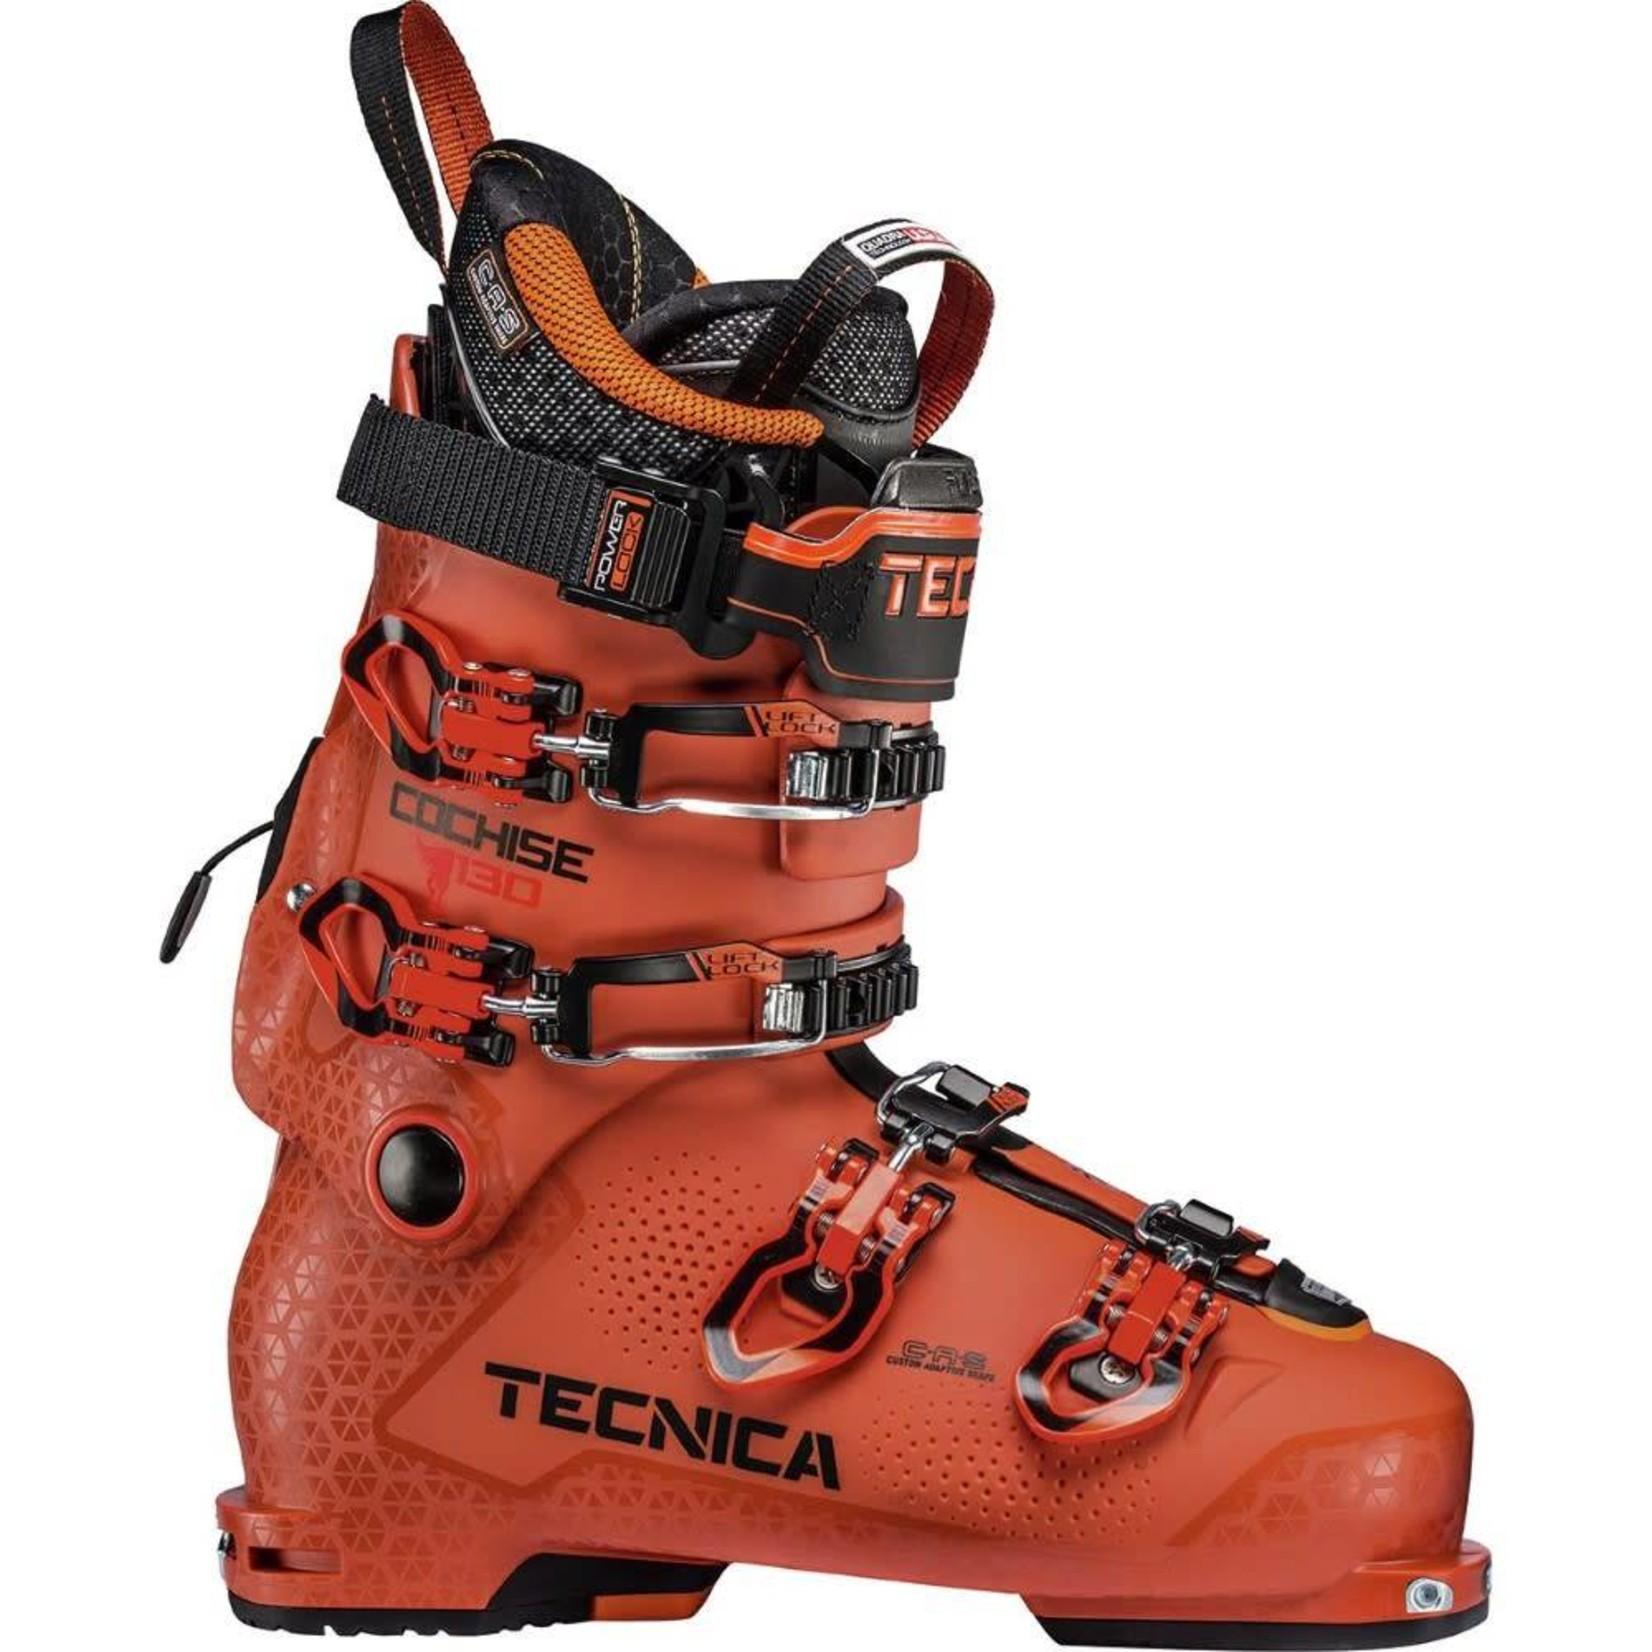 Tecnica Botte de ski Tecnica Cochise 130 DYN